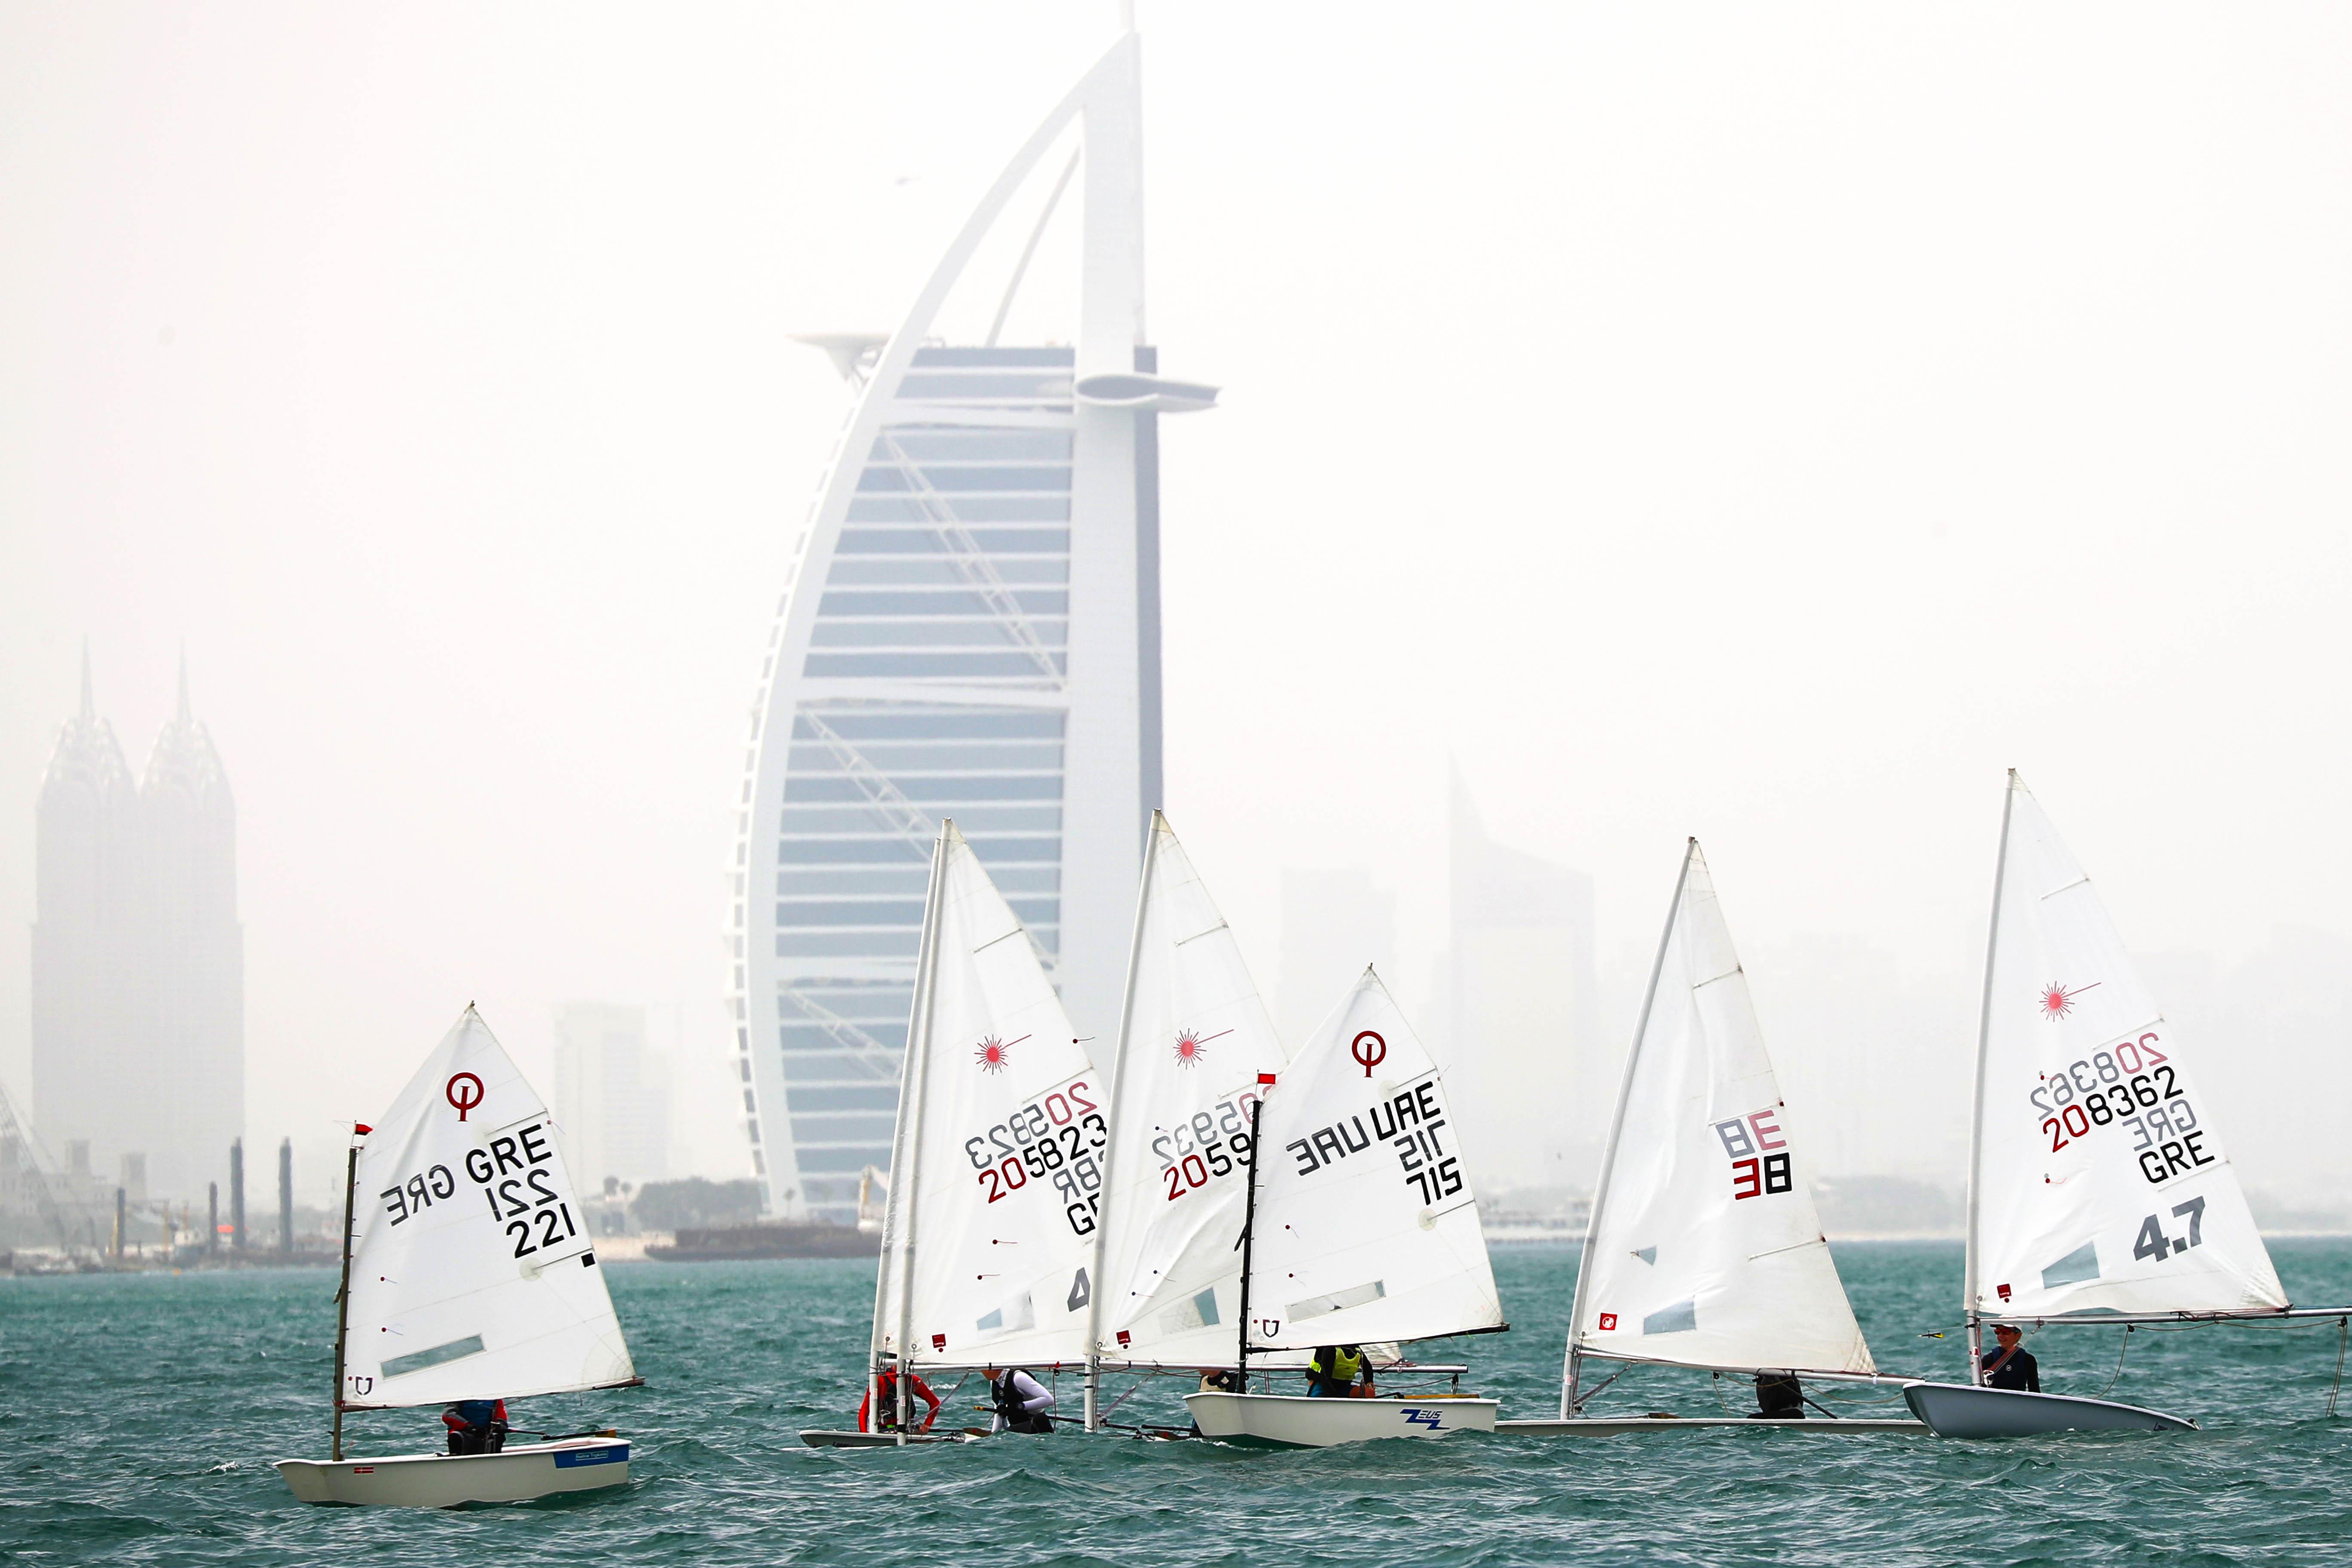 Dubai Watersports Summer Week starts at Al Shurooq Beach